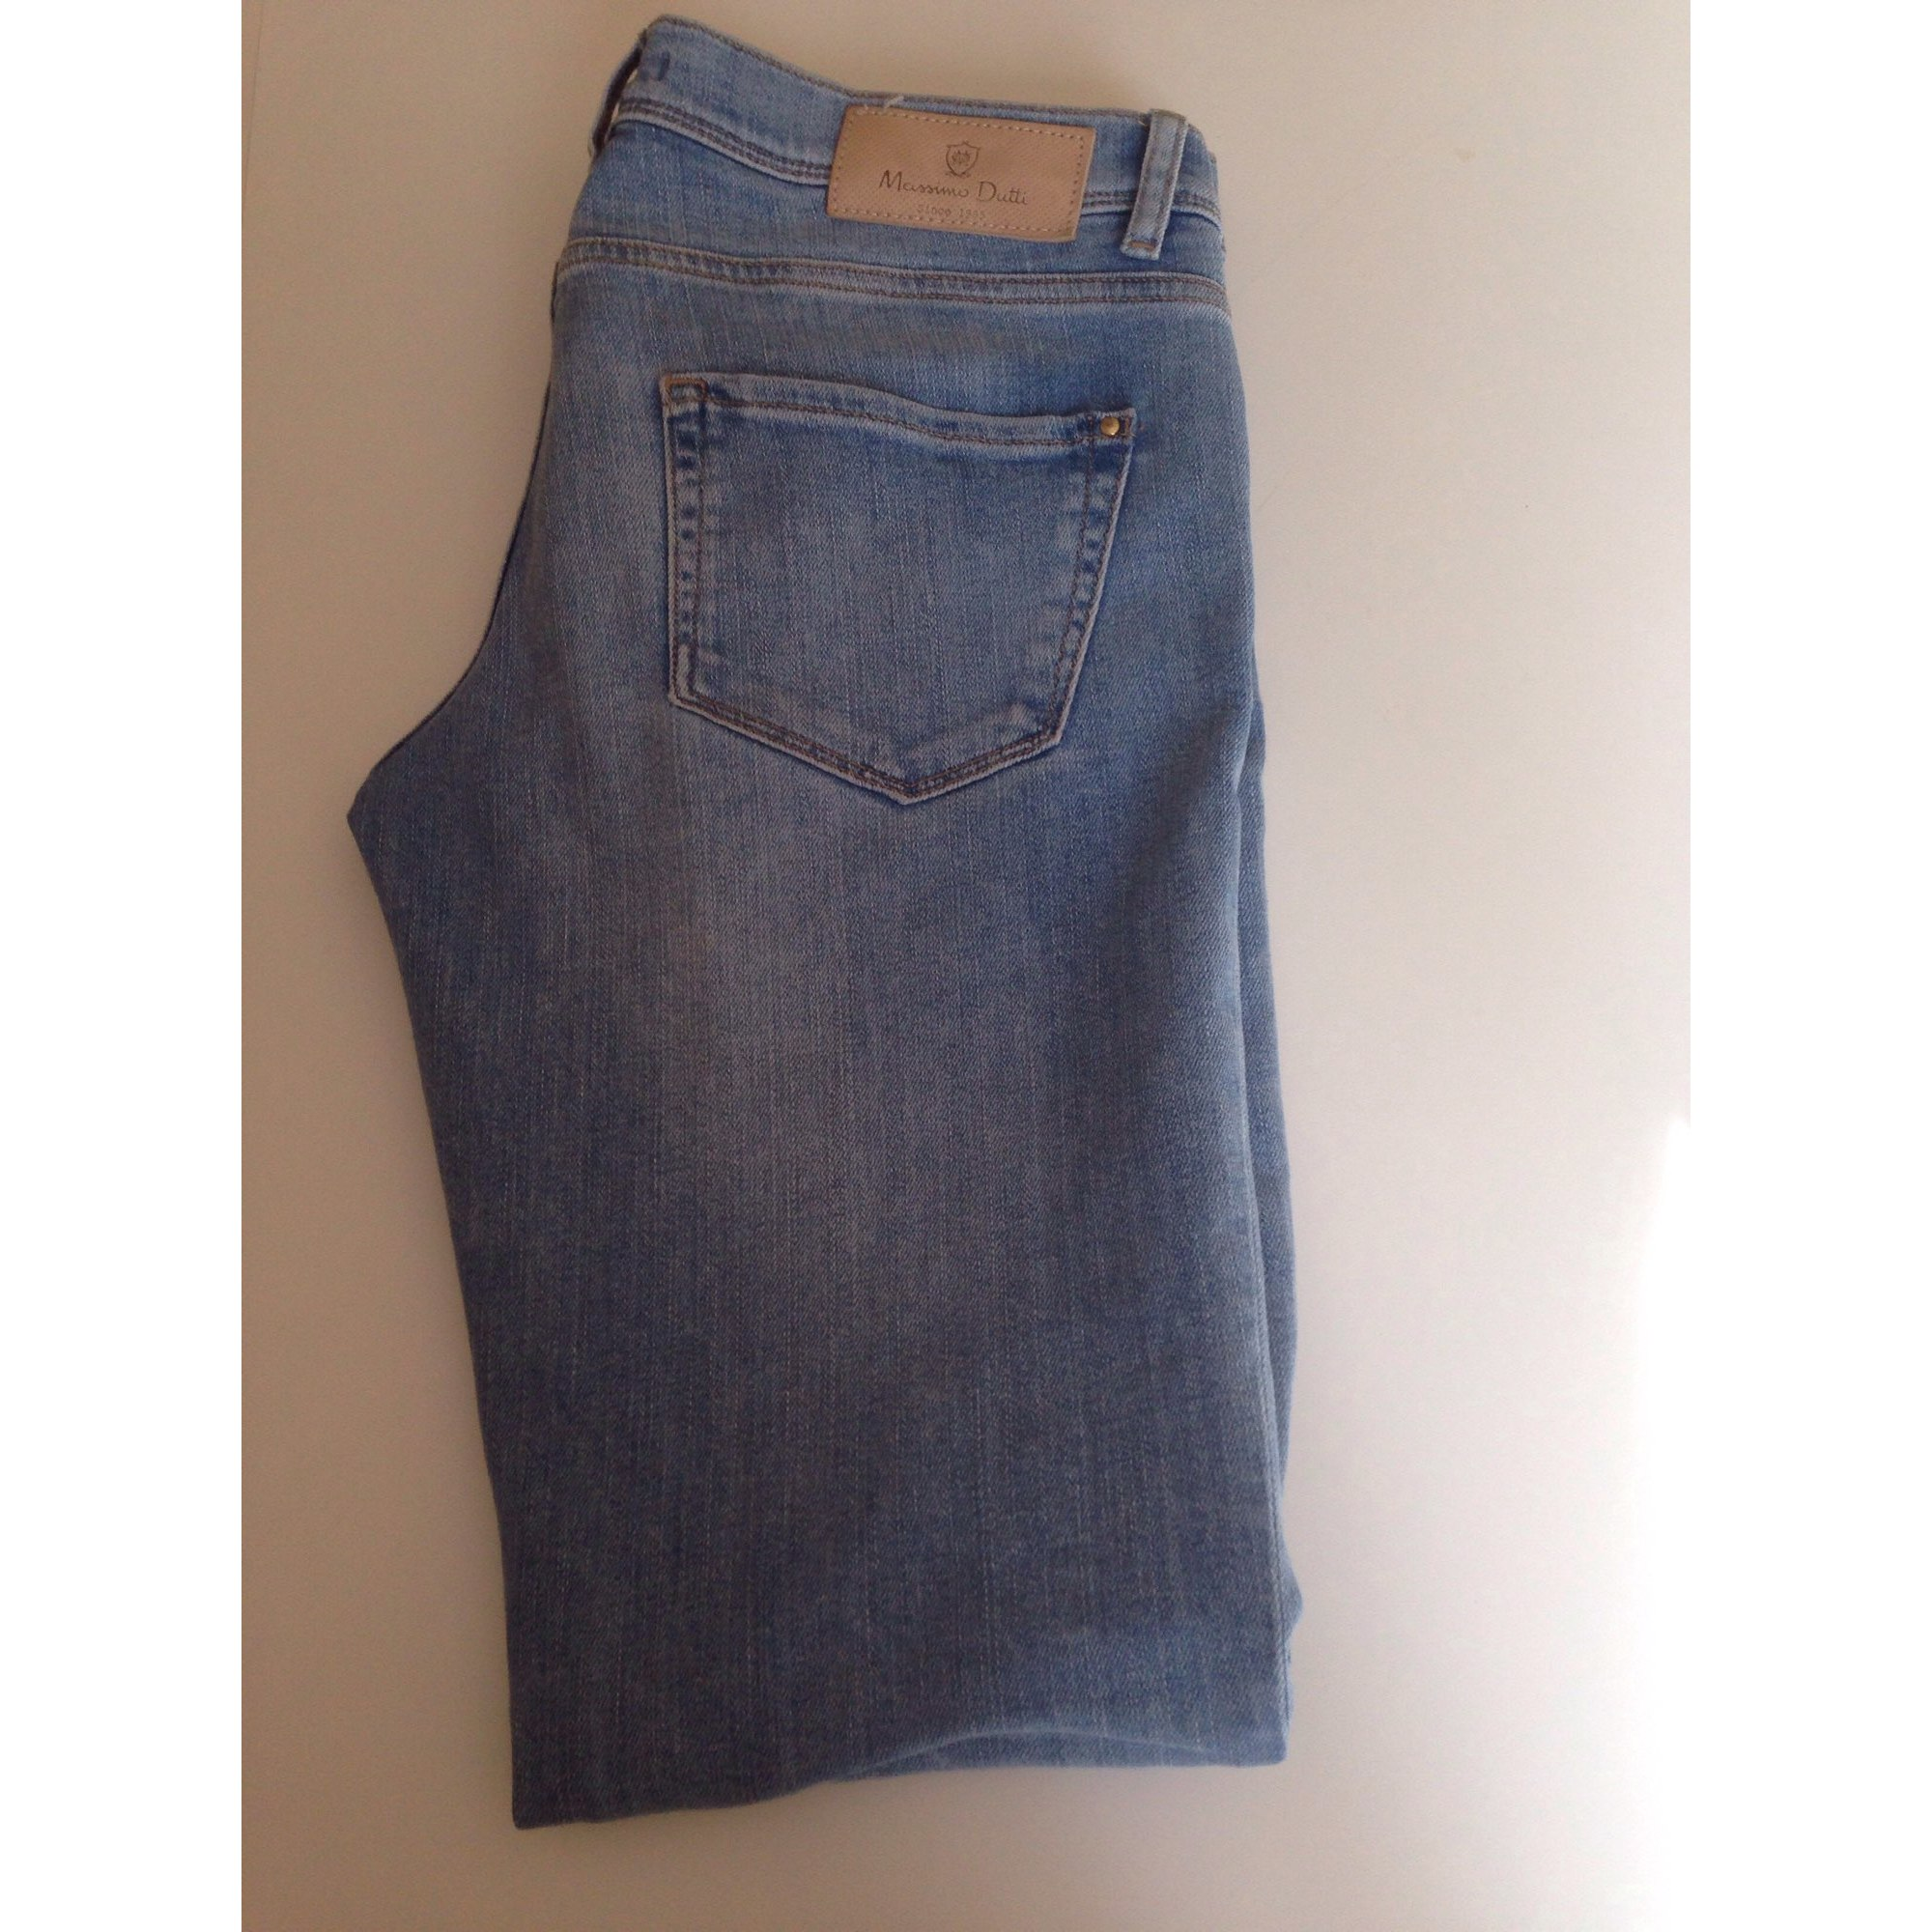 Jeans slim MASSIMO DUTTI Bleu, bleu marine, bleu turquoise